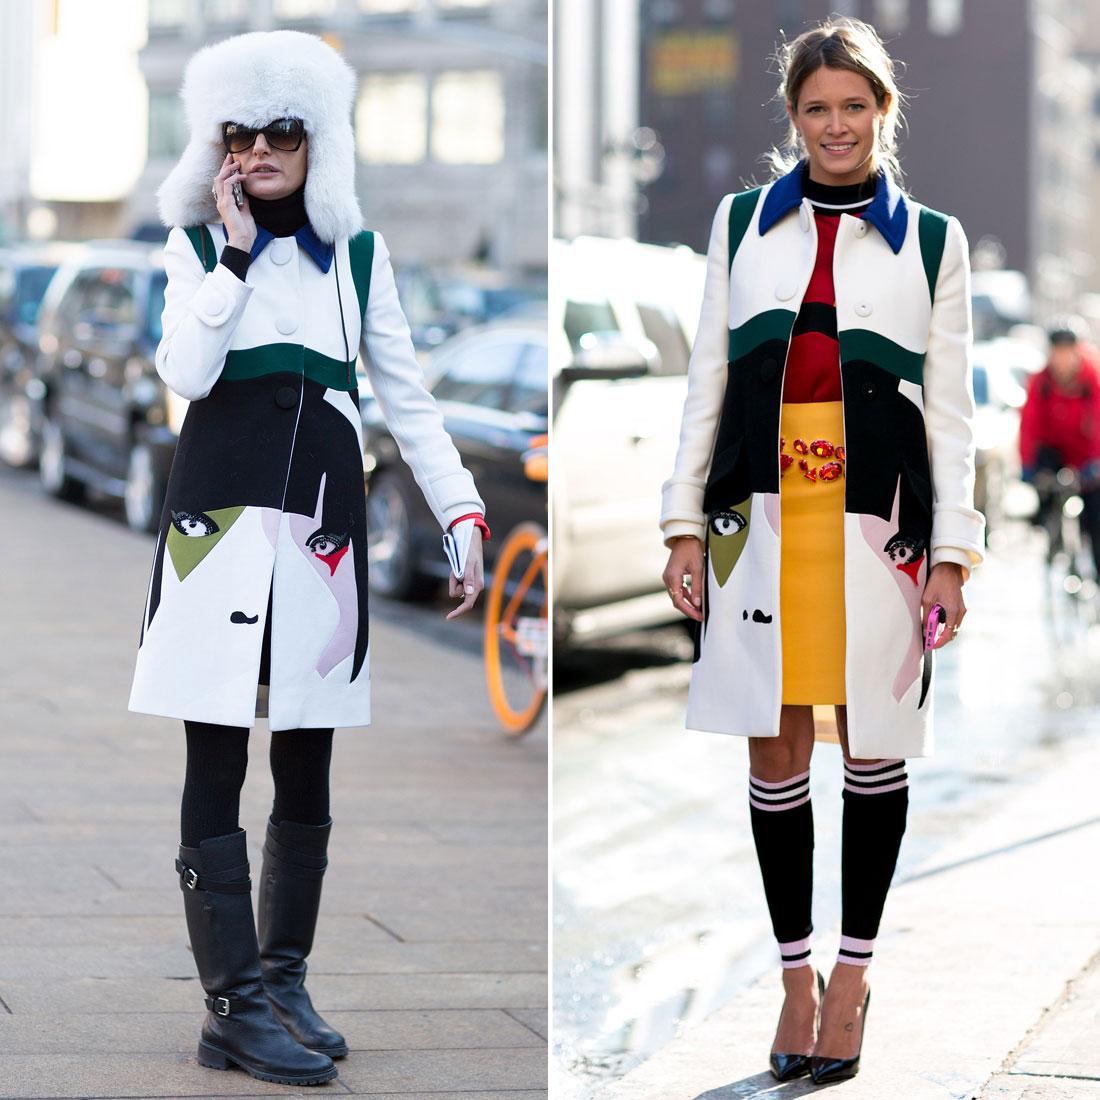 Giovanna Battaglia and Helena Bordon both made use of Prada's Spring '14 collection with their bold face-emblazoned coats.